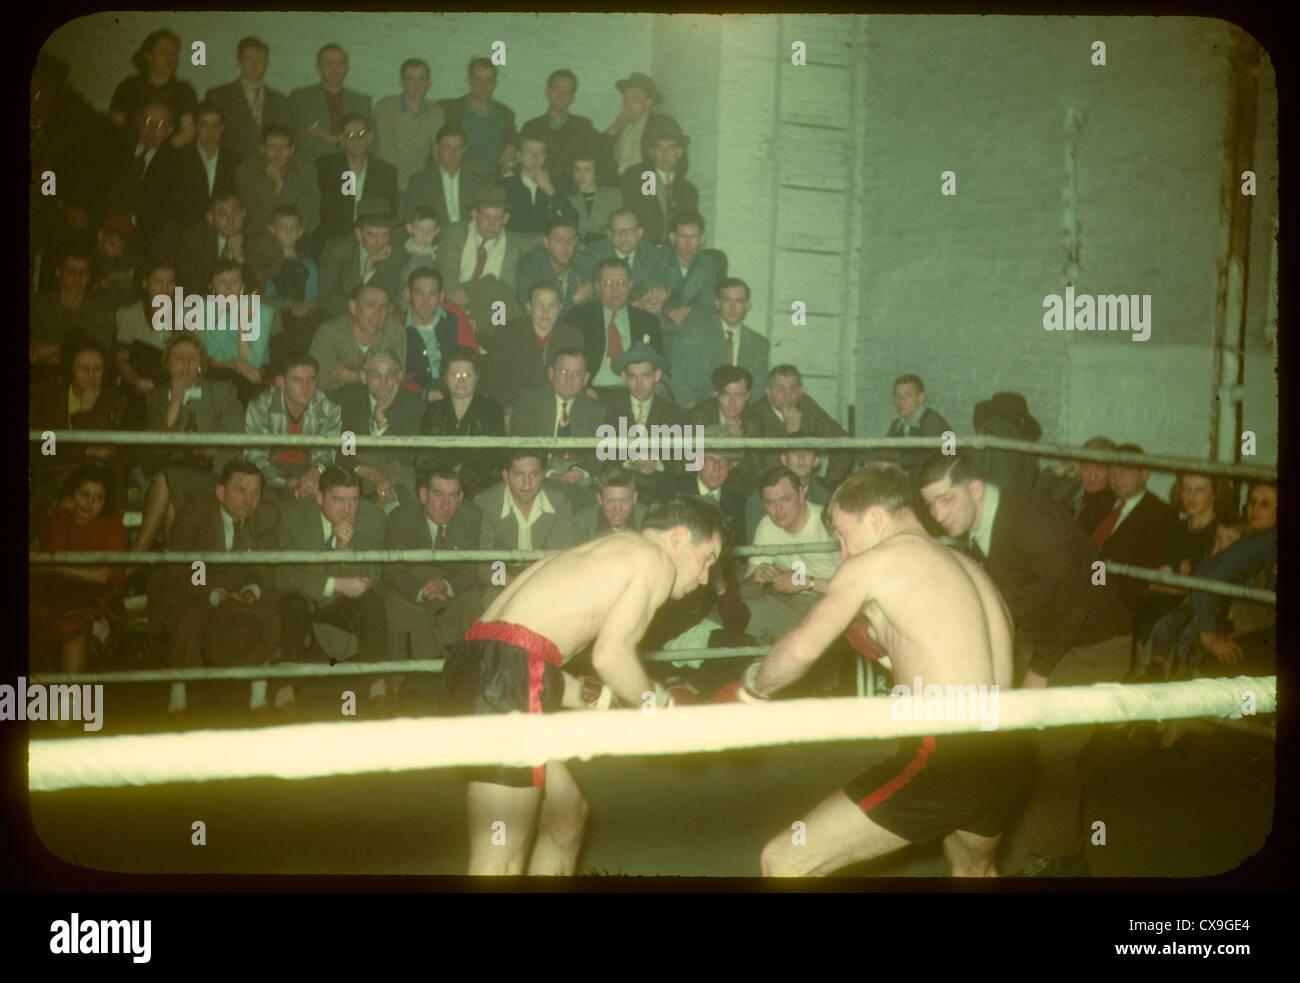 Combate de boxeo 1950 deportes boxeadores golpe de aterrizaje punch color kodachrome fighters lucha lucha ring público Imagen De Stock